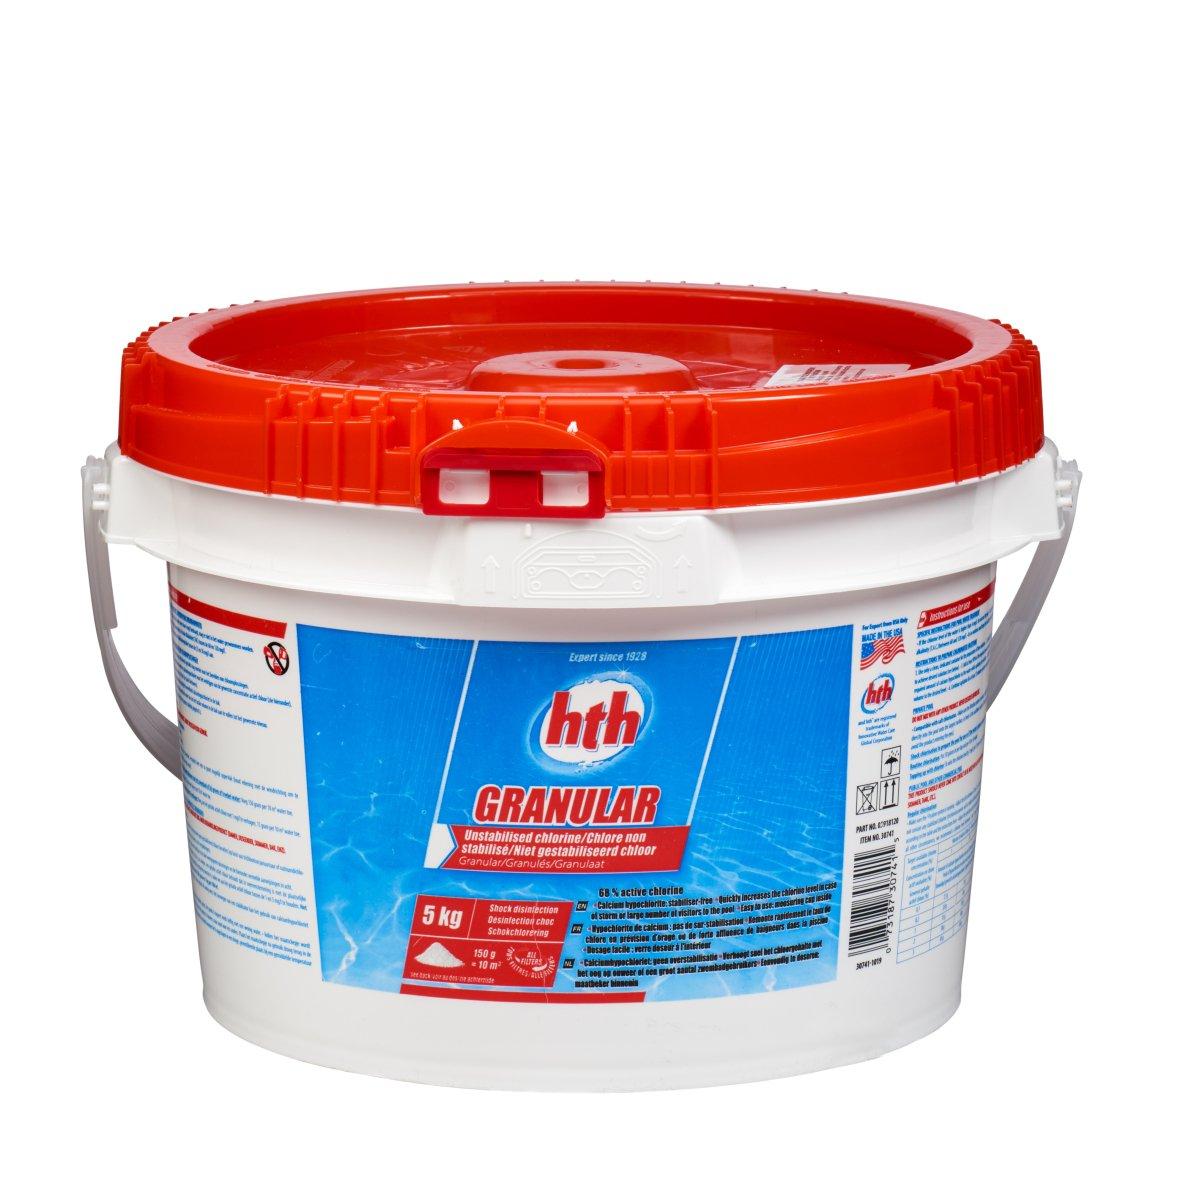 HTH granular 5 kg